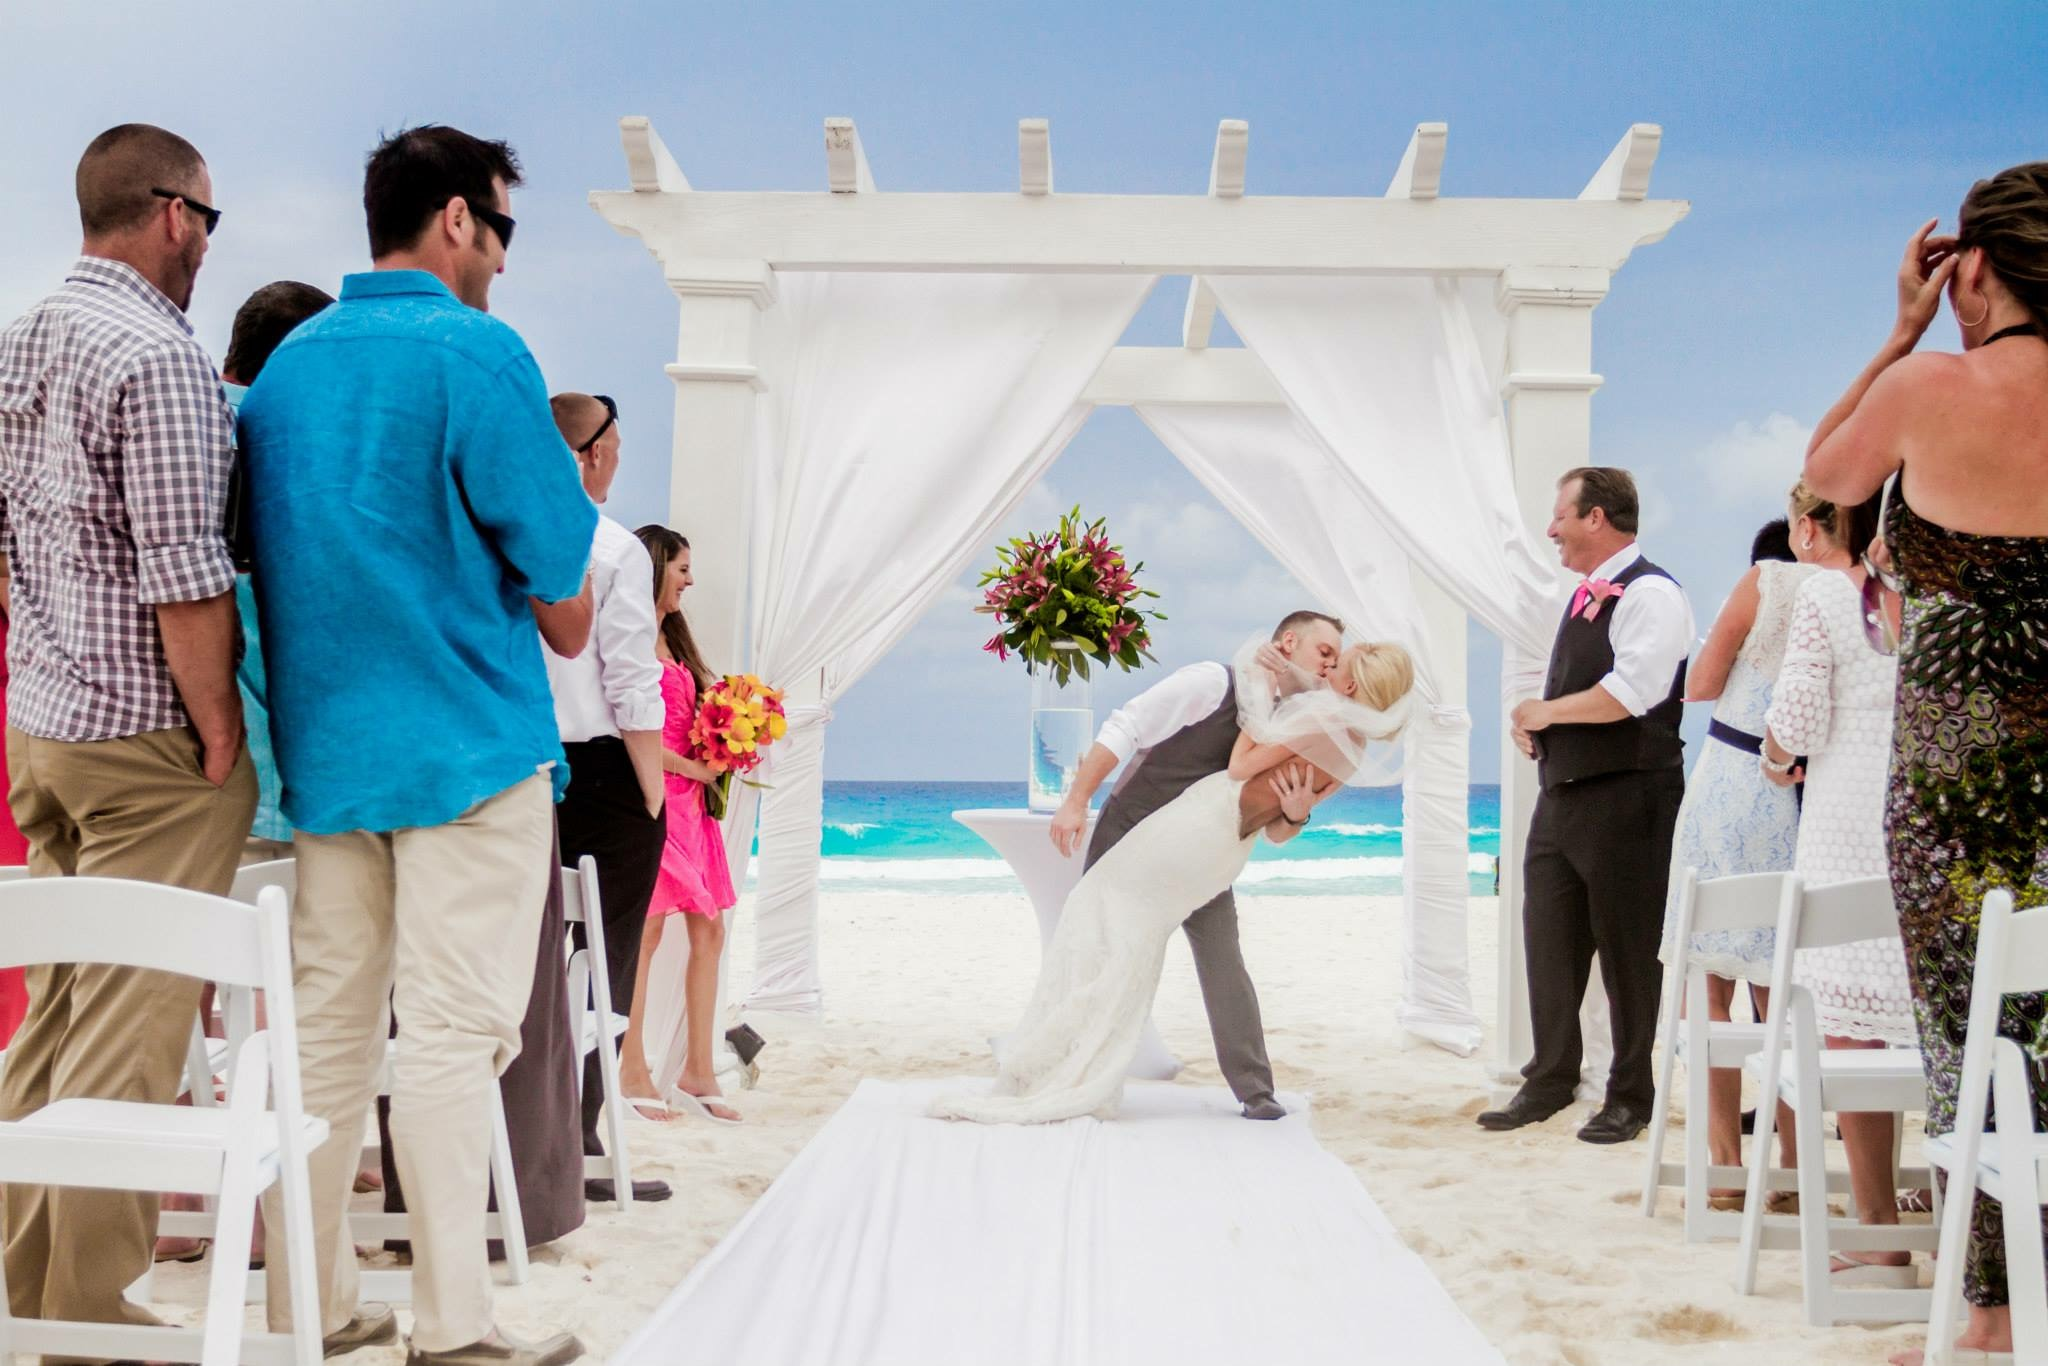 krysten-reed-cancun-beach-wedding-12.JPG